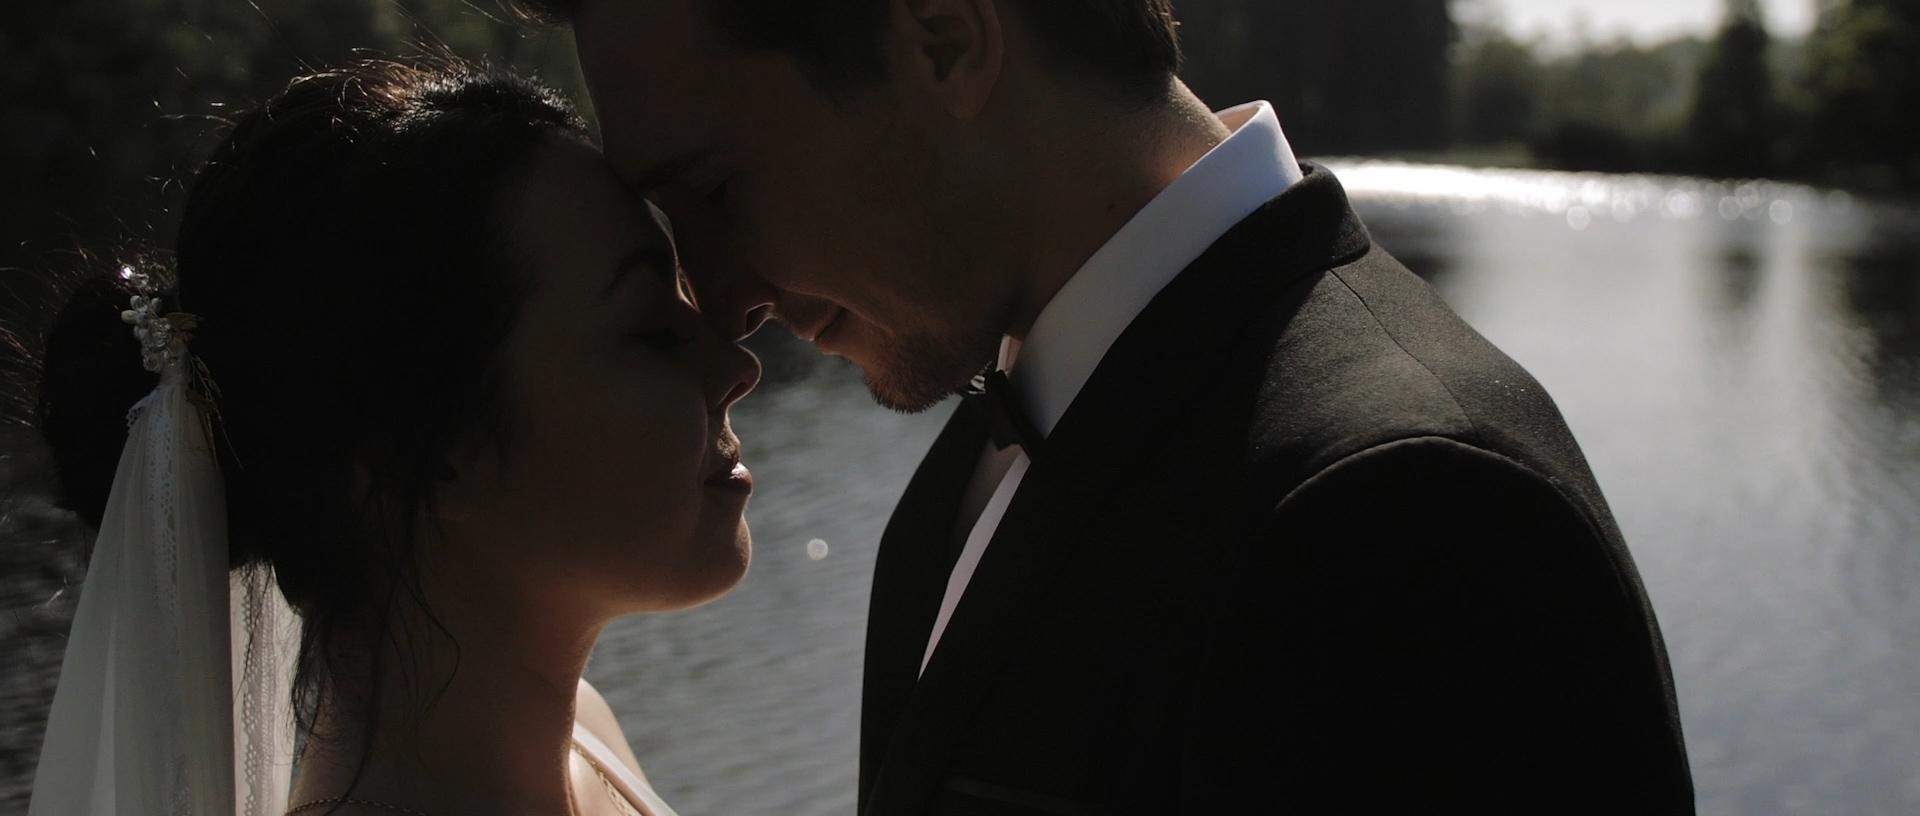 drygate-wedding-videographer_LL_07.jpg